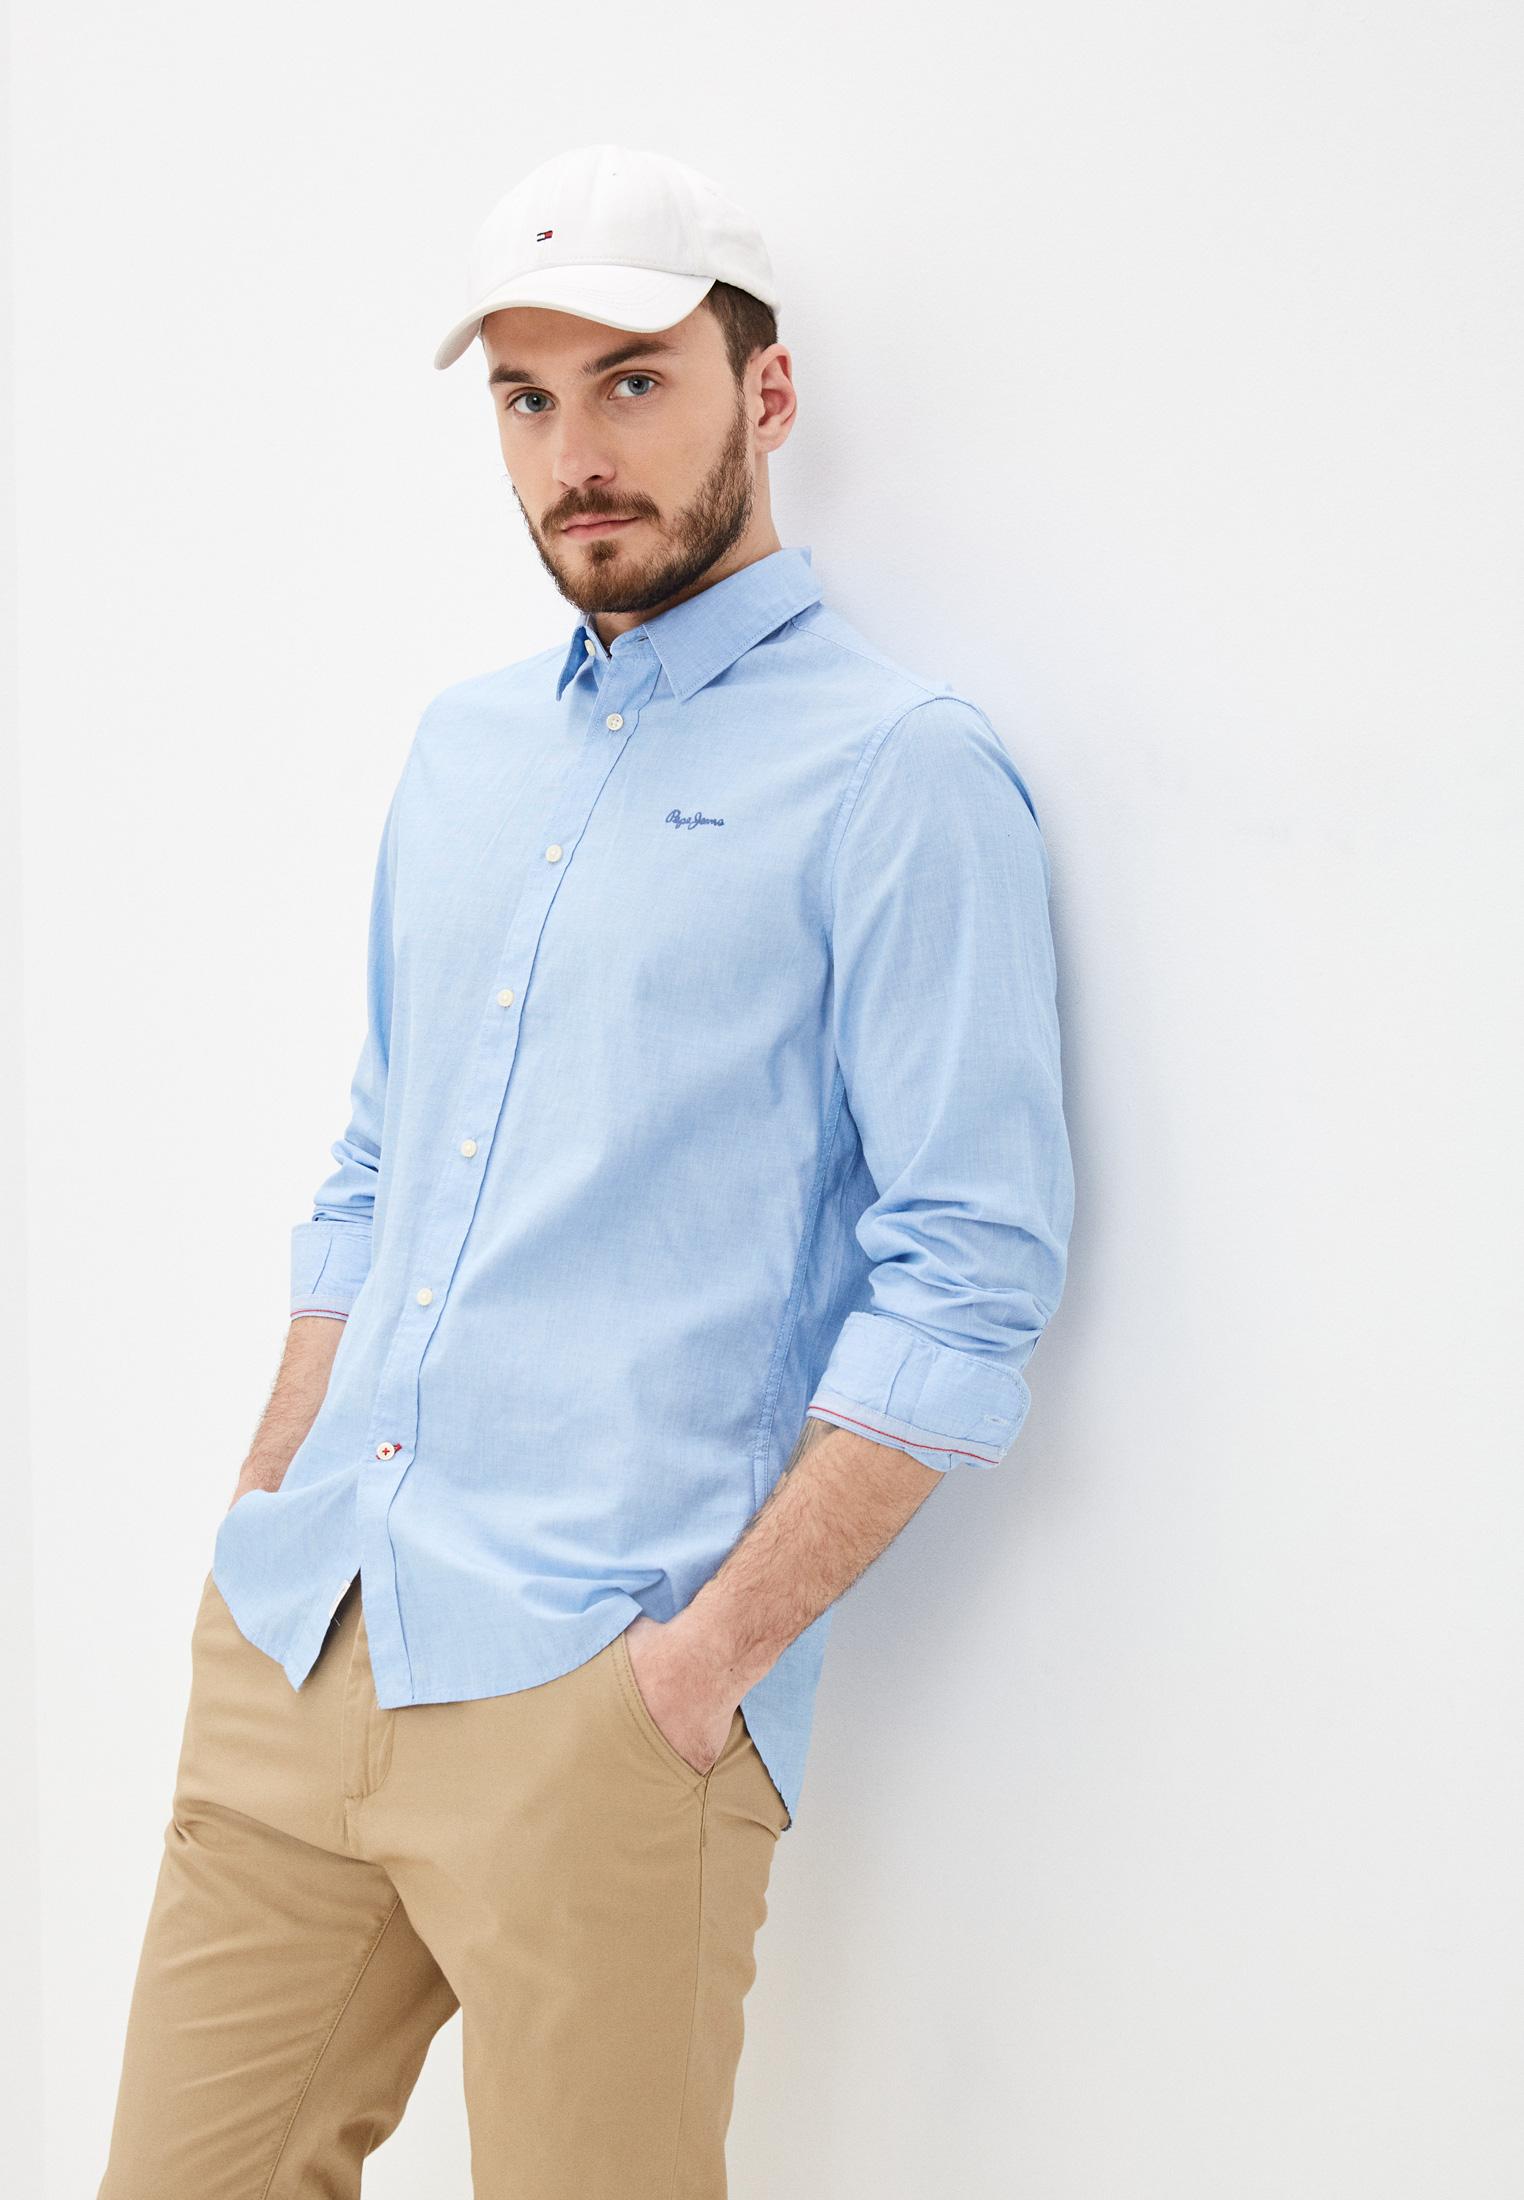 Рубашка с длинным рукавом Pepe Jeans (Пепе Джинс) PM307025